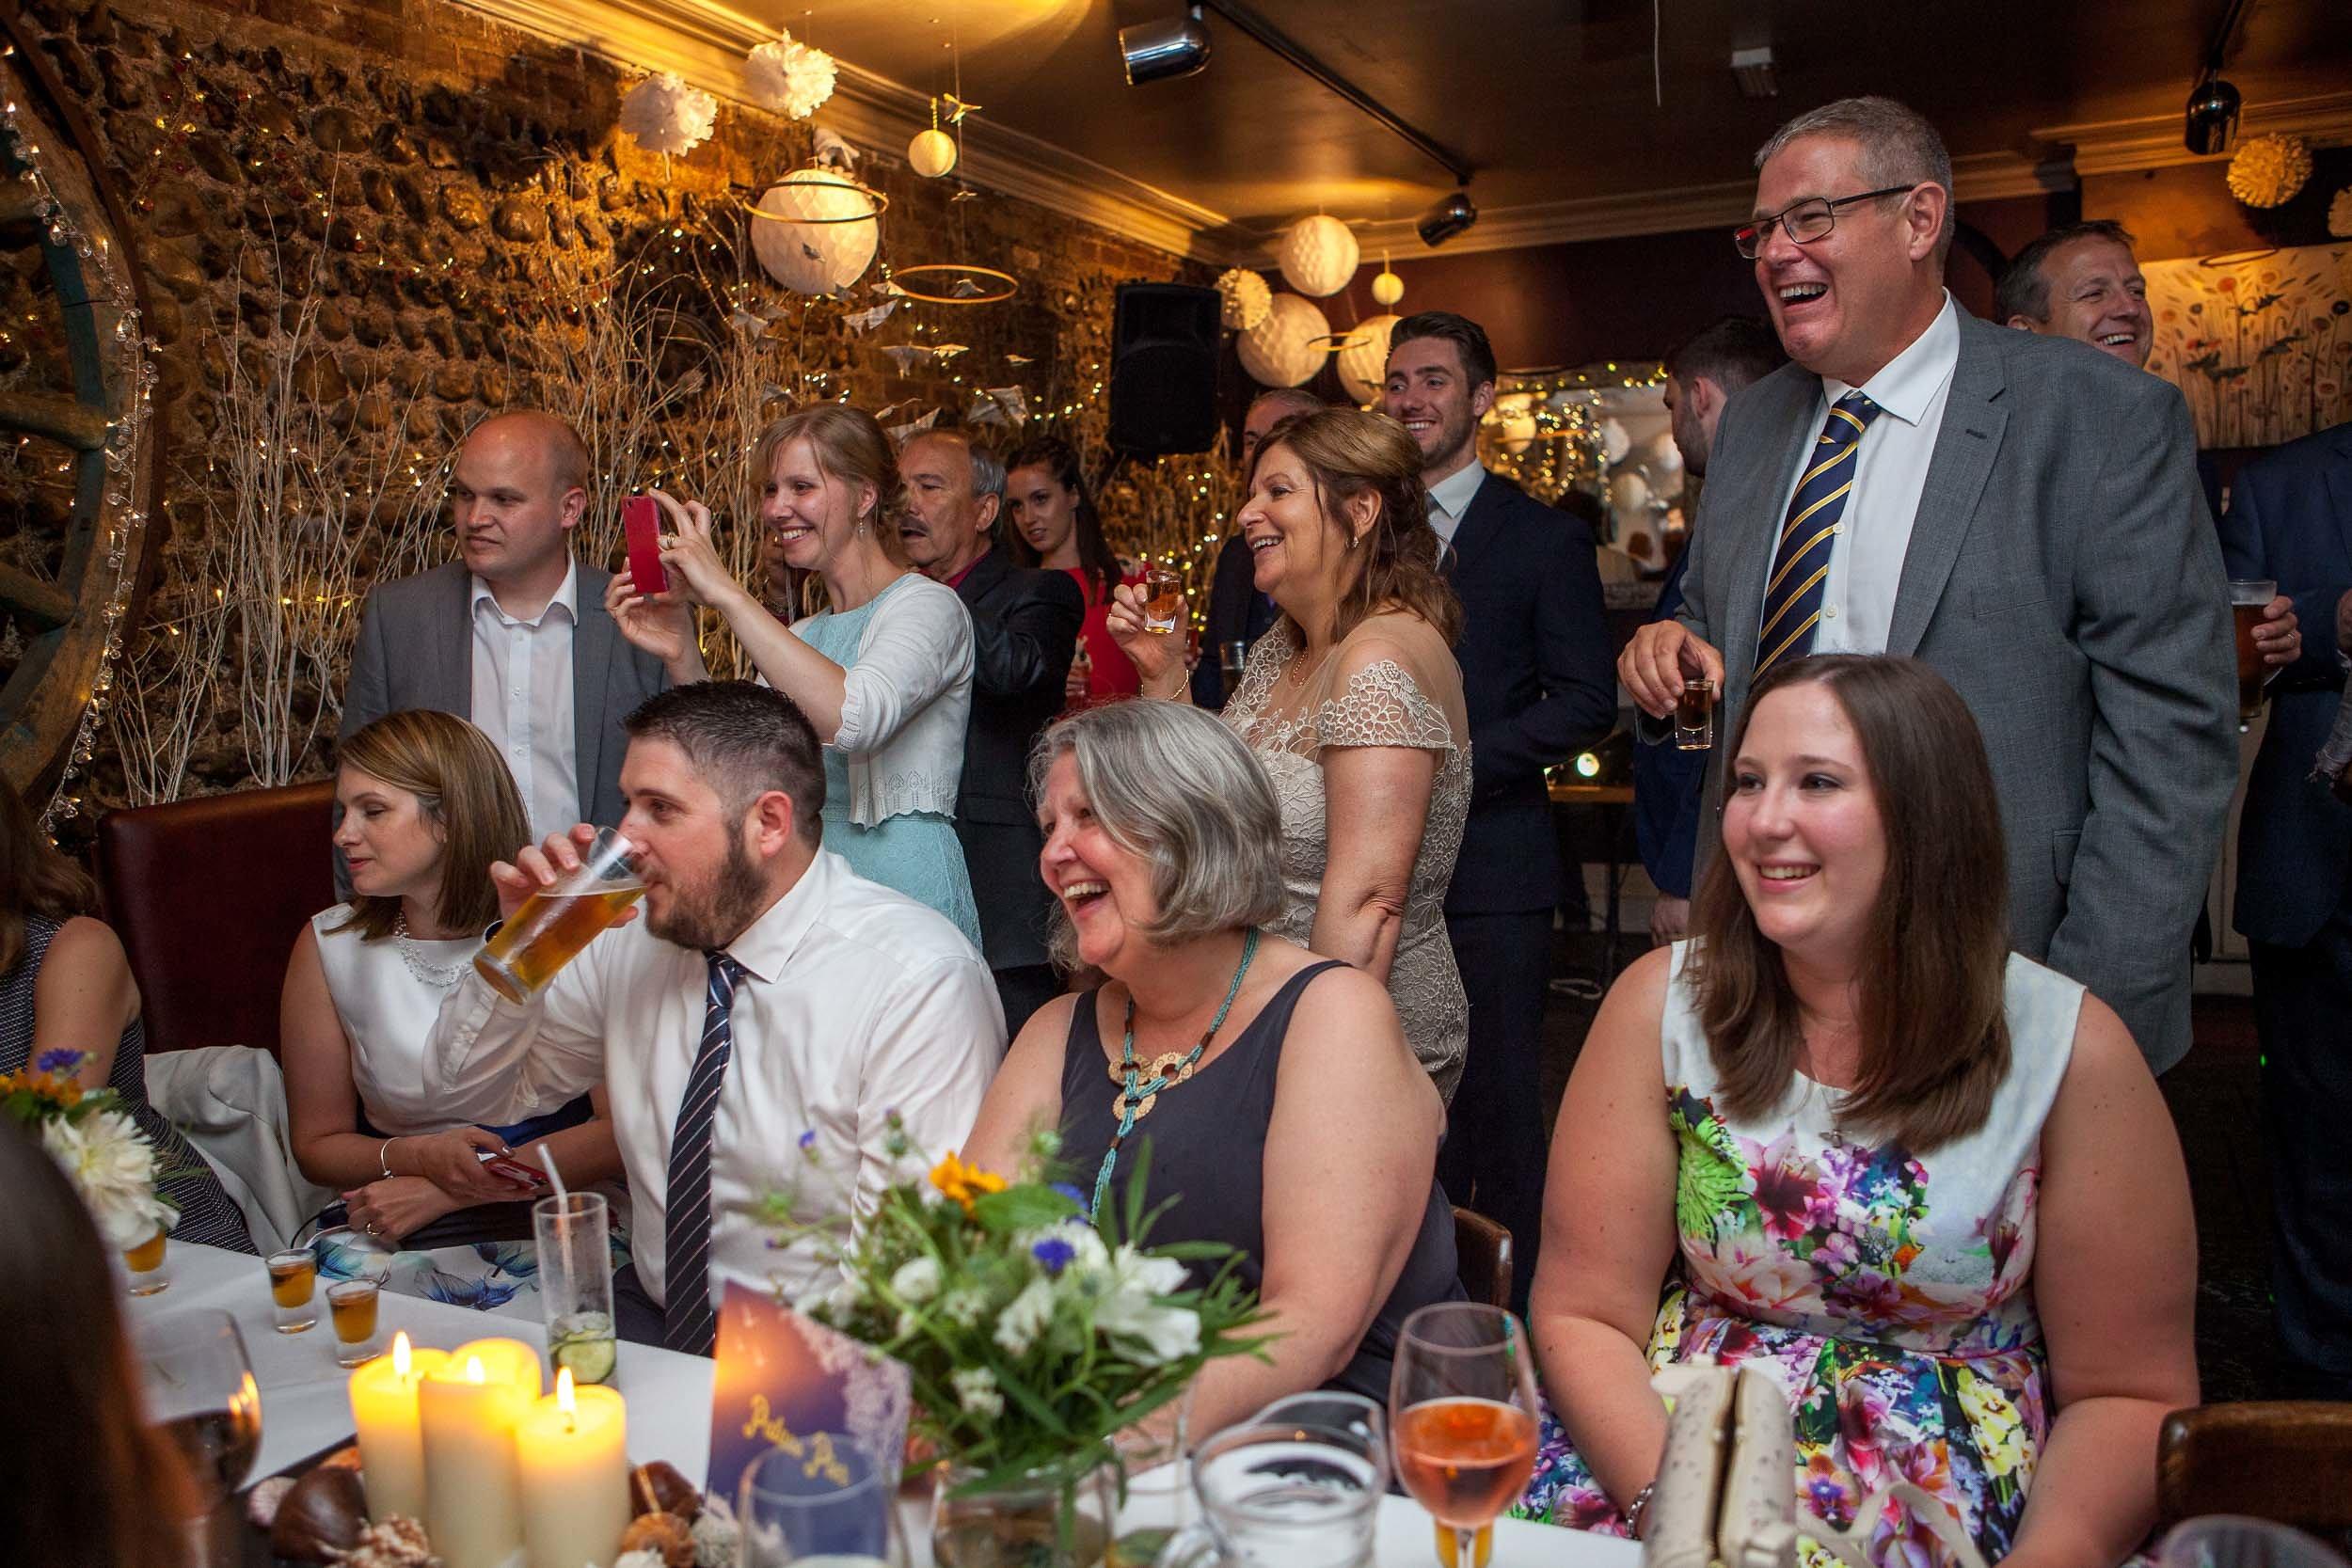 brighton coach house wedding